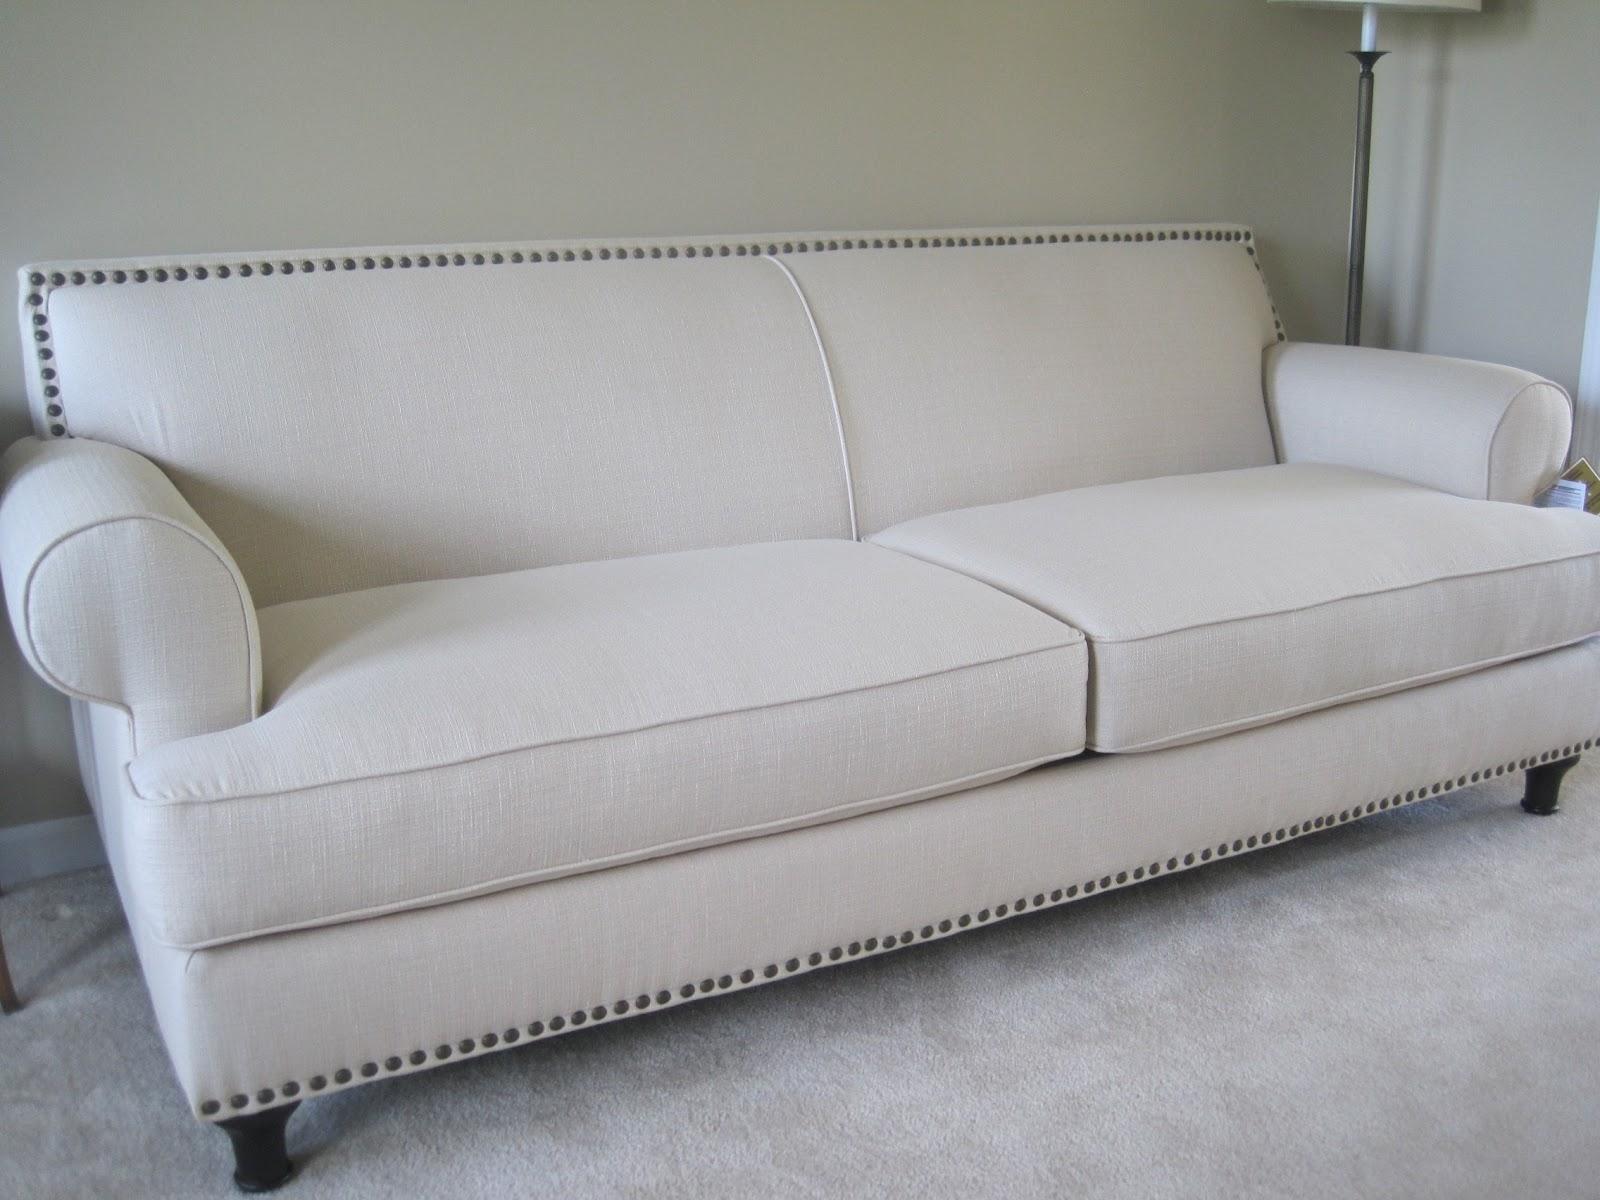 boardwalk sofa review stickley leather craigslist pier one carmen reviews shapeyourminds